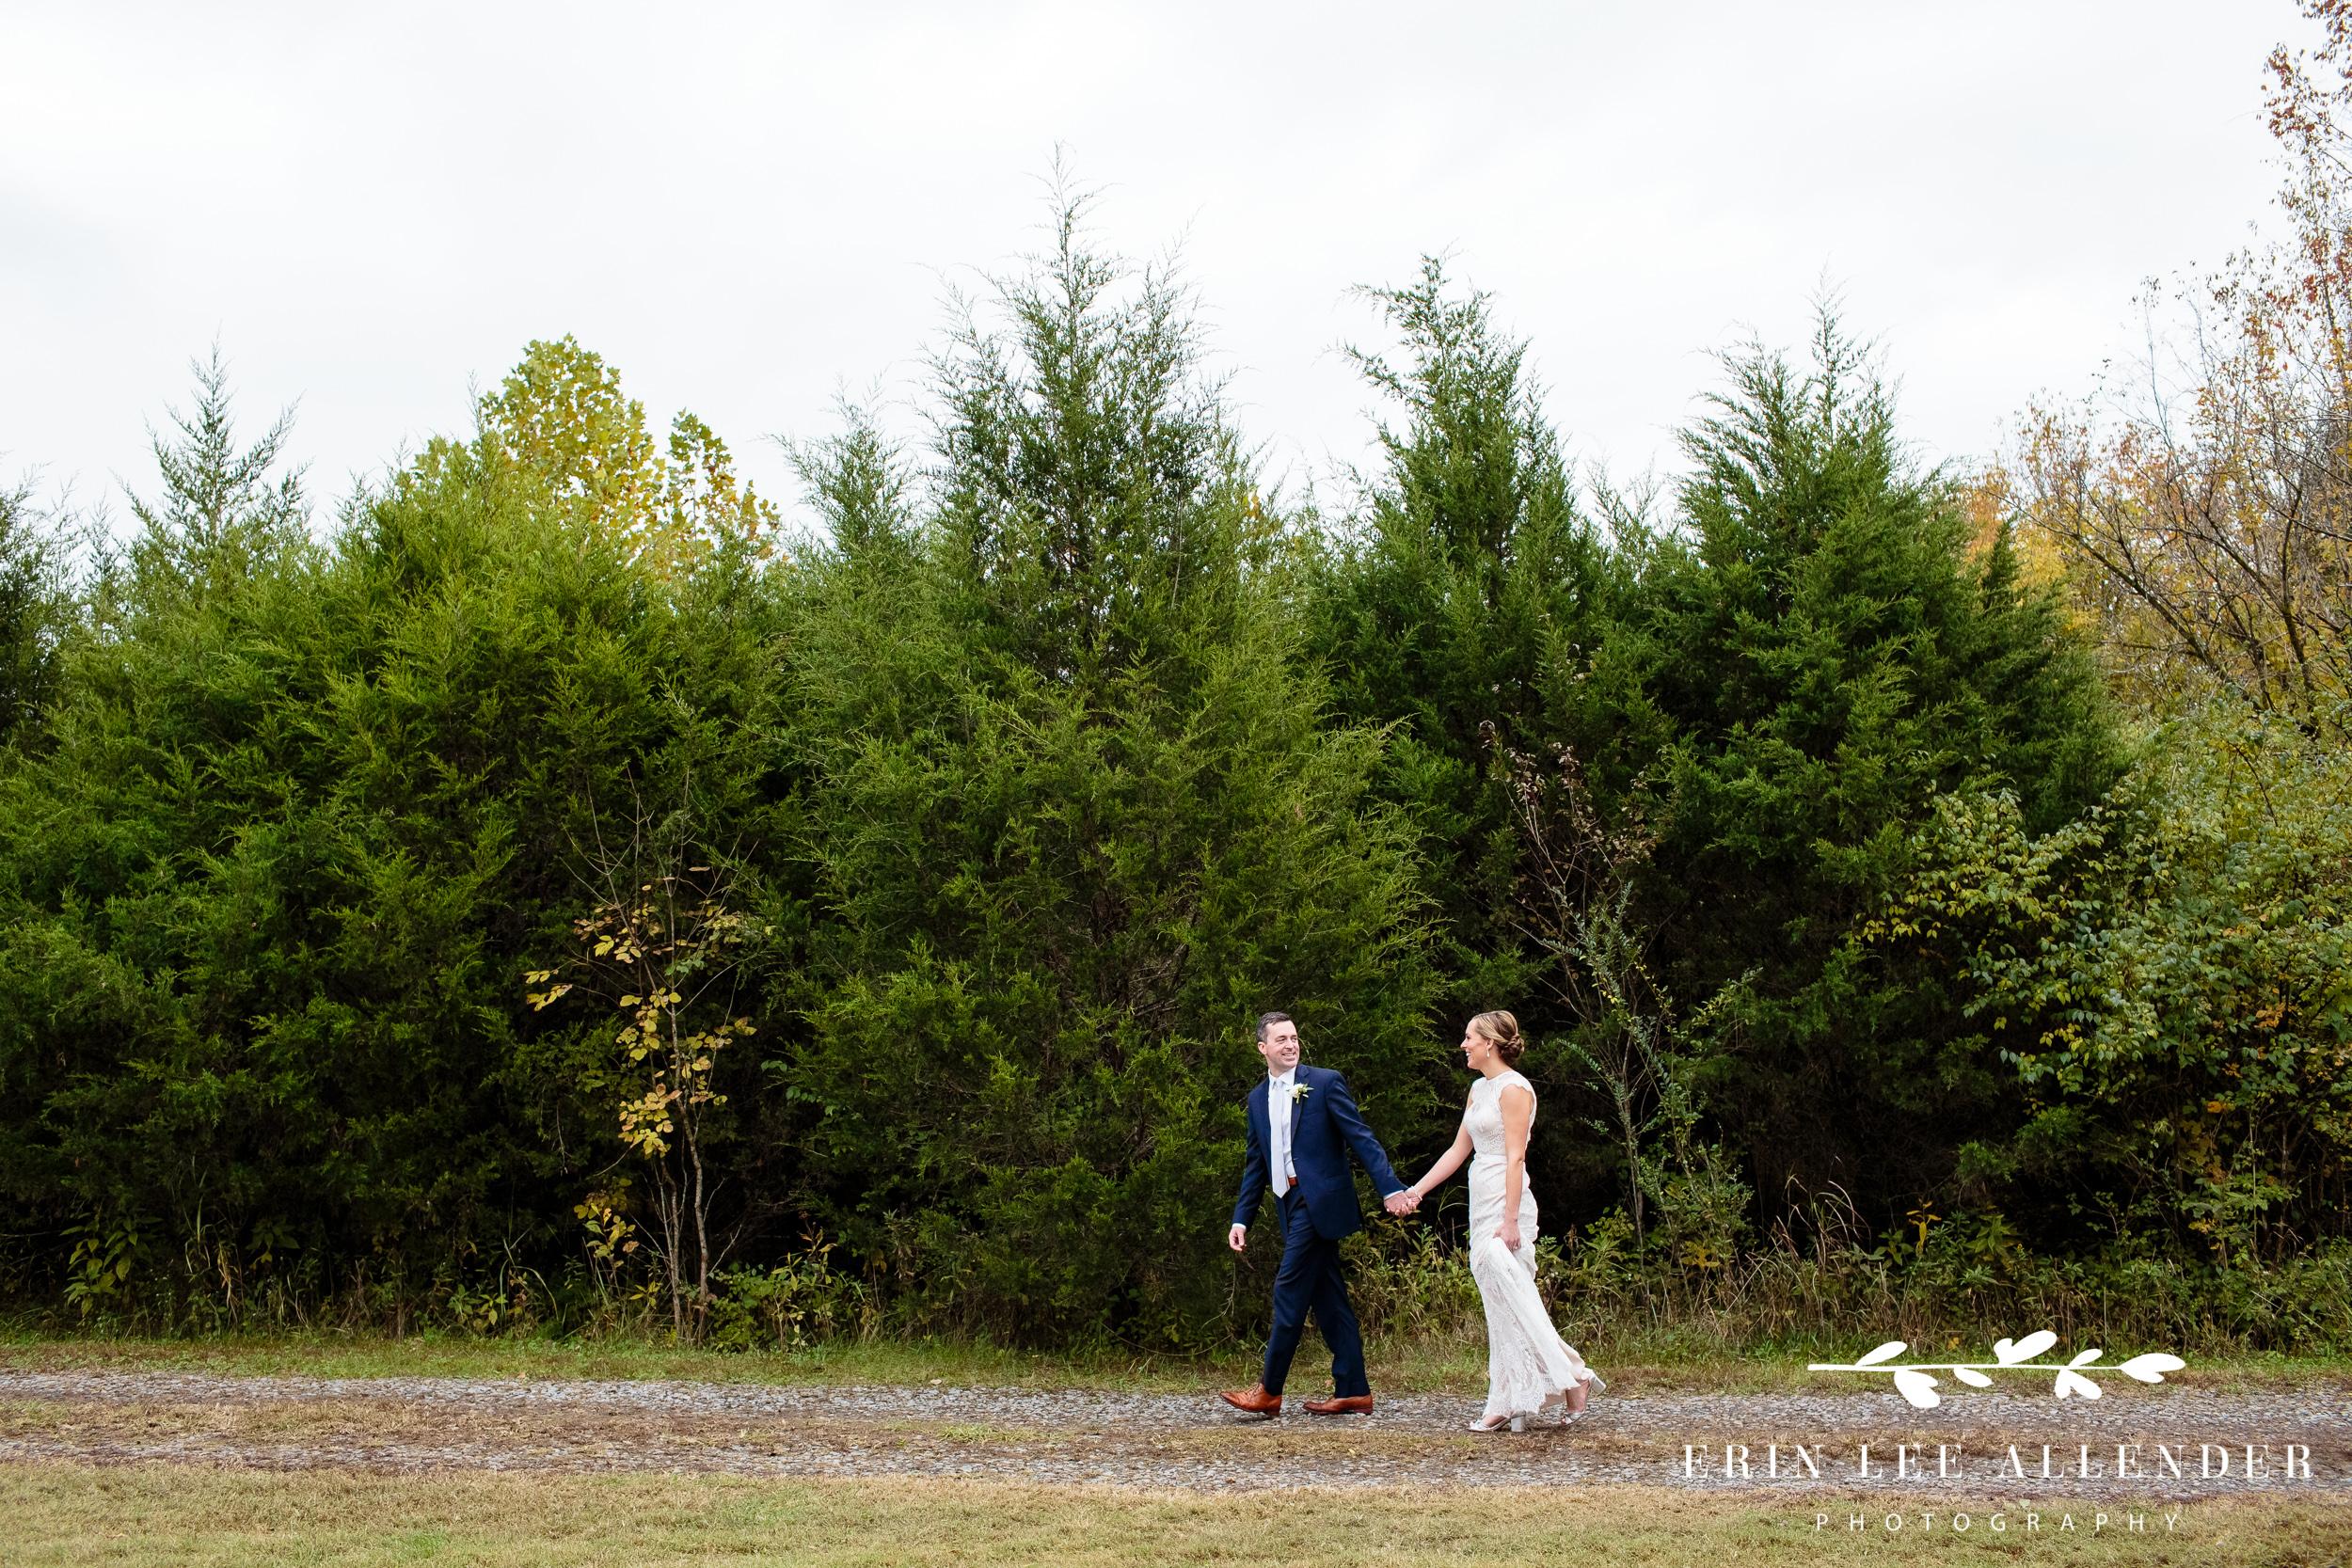 Couple-walking-pine-trees